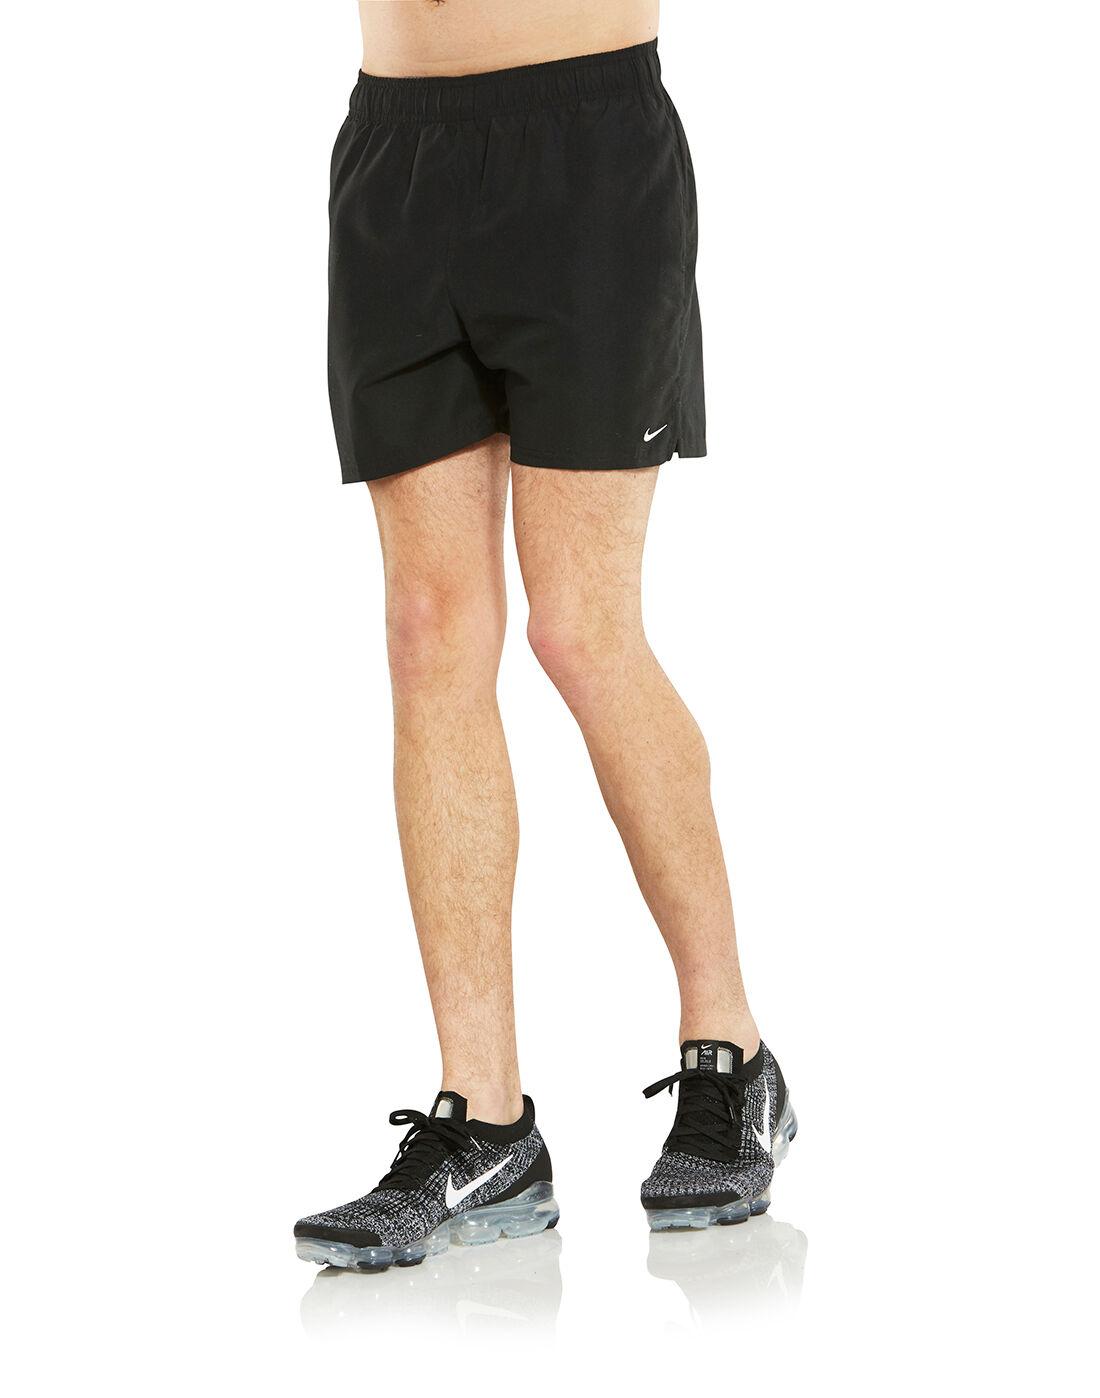 Nike Mens 5 Inch Volley Shorts - Black | Life Style Sports EU